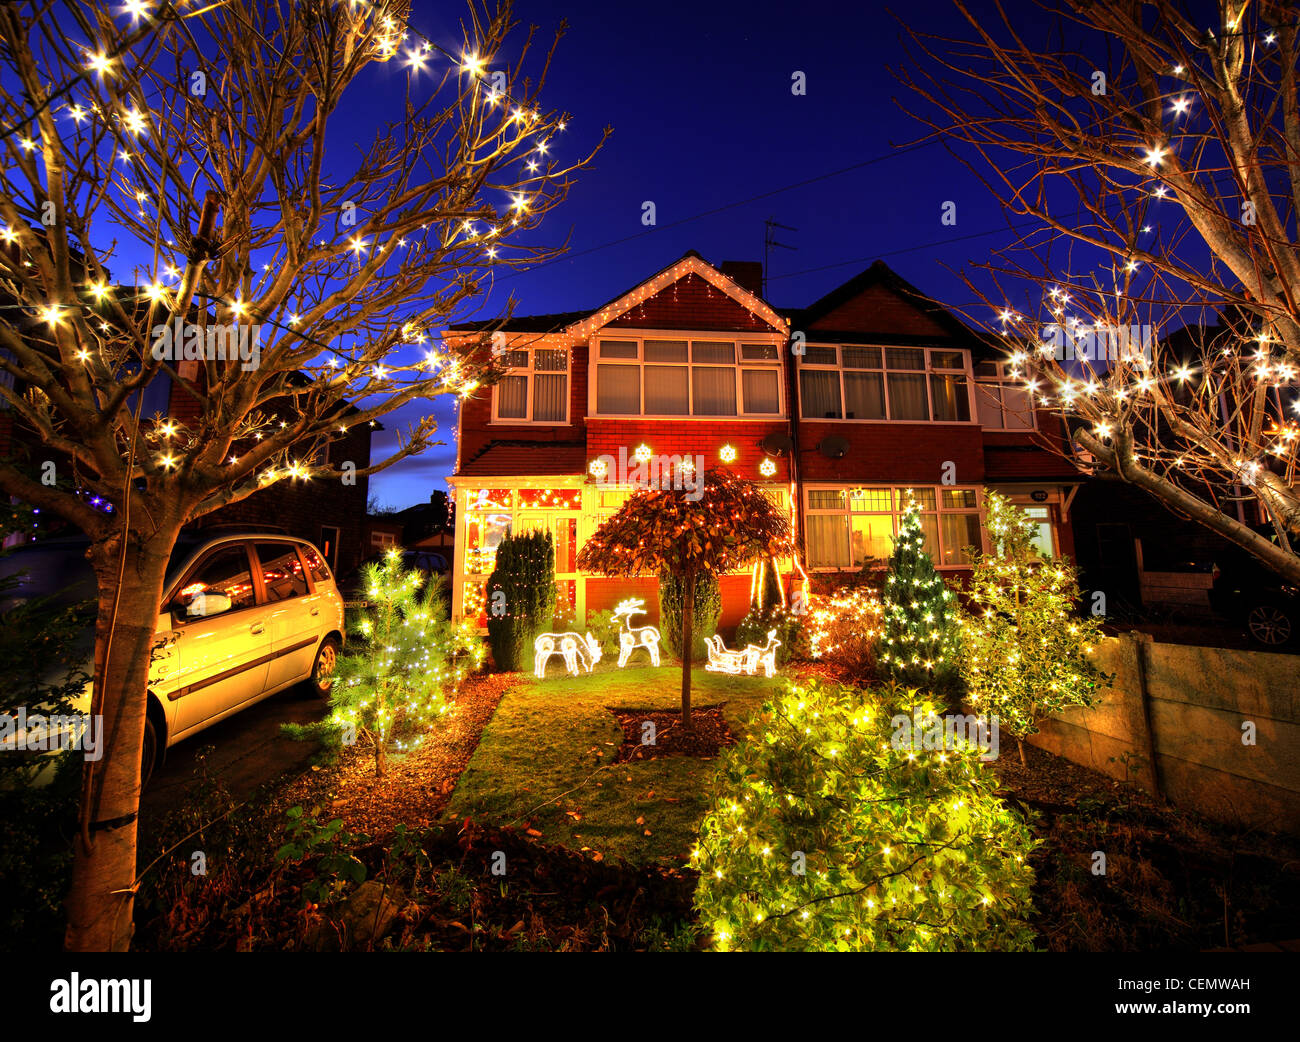 320 Padgate Lane Christmas lights Dusk,Warrington Cheshire England,UK,super,Xmas,illuminations,crazy,interesting,grass,lawn,car,DIY,do,it,yourself,Homebase,jolly,fun,humour,humourous,gotonysmith,320 Padgate Lane Christmas lights Dusk,Warrington Cheshire.jpg,gotonysmith,Warringtonians,Buy Pictures of,Buy Images Of